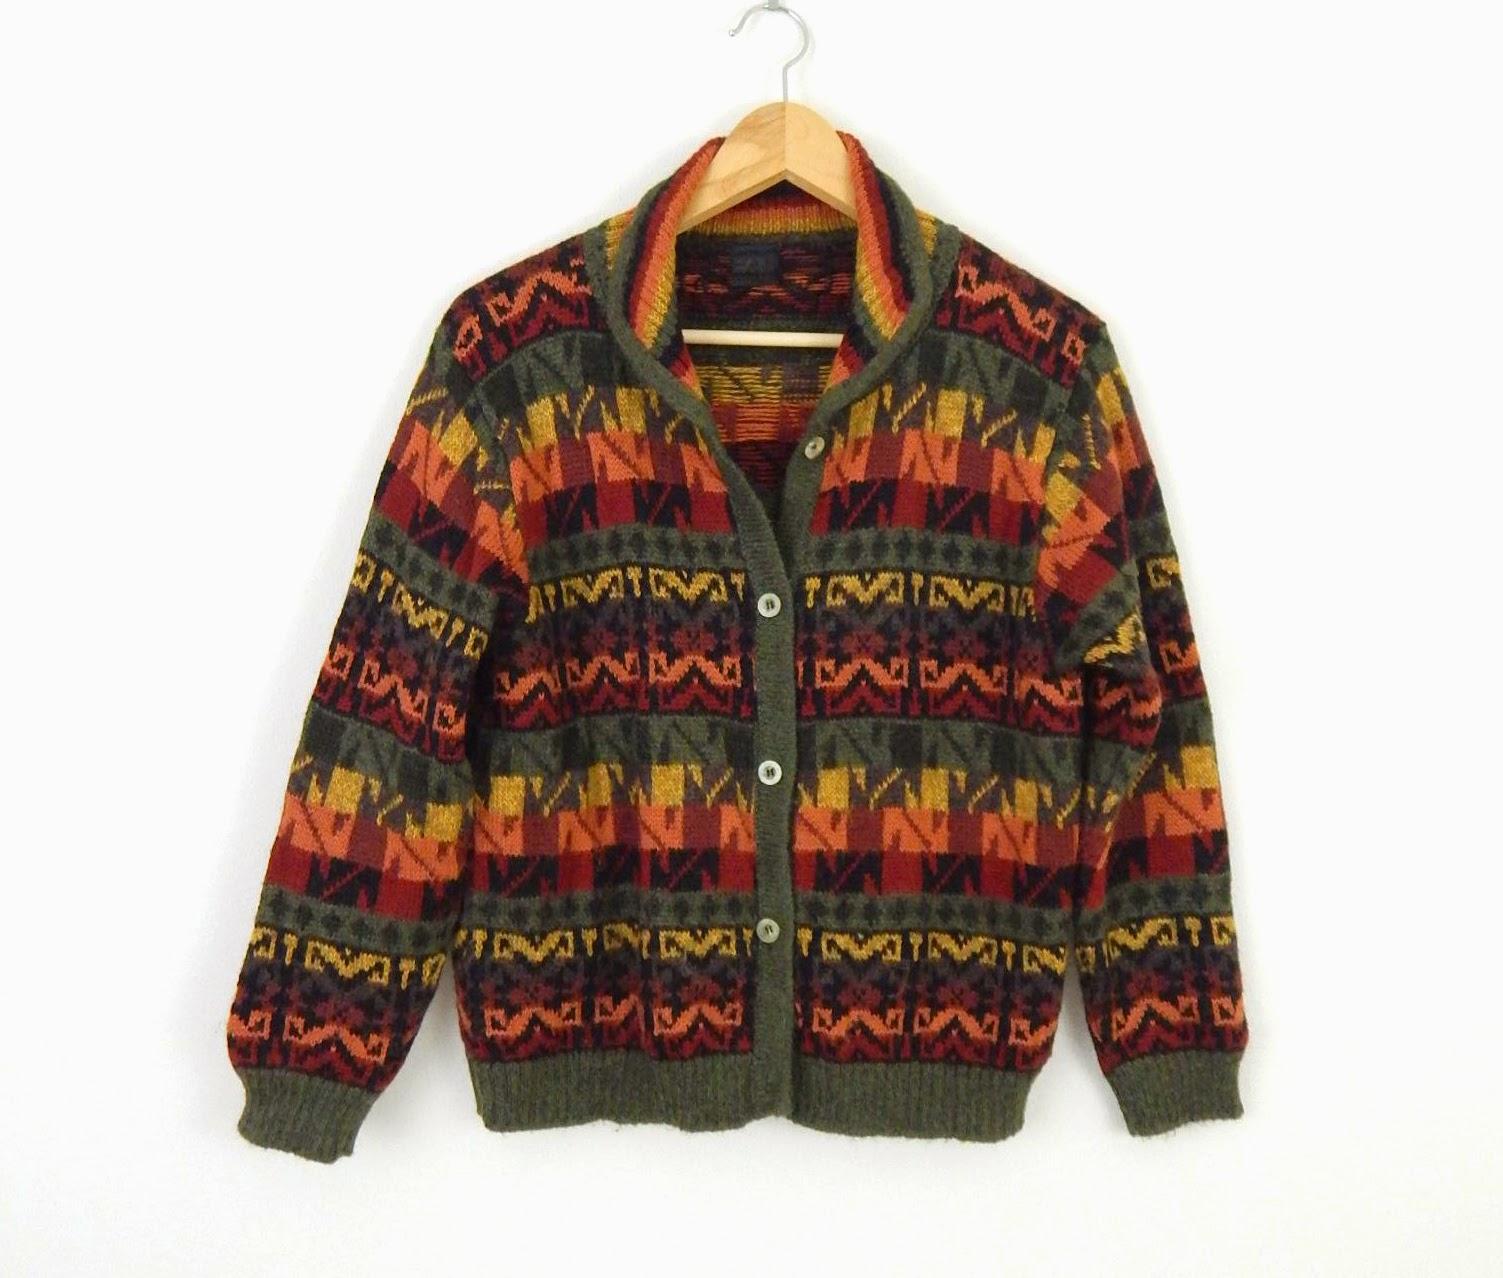 https://www.etsy.com/listing/175649776/vintage-90s-peruvian-alpaca-sweater?